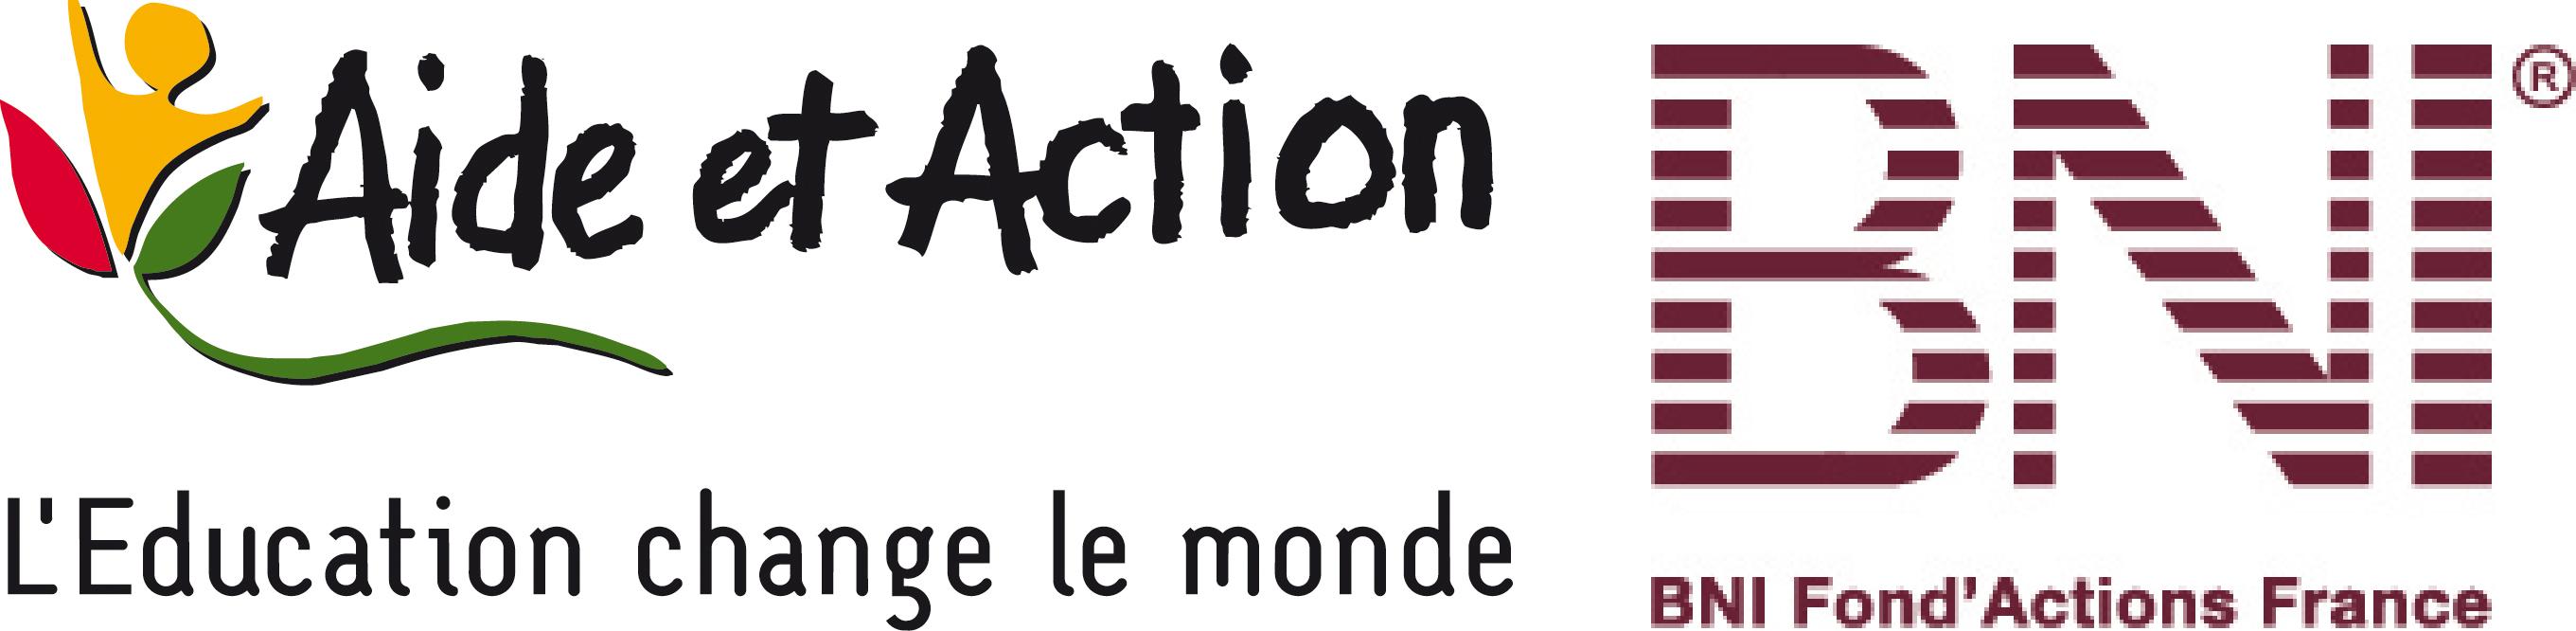 aide et action logo fr rvb